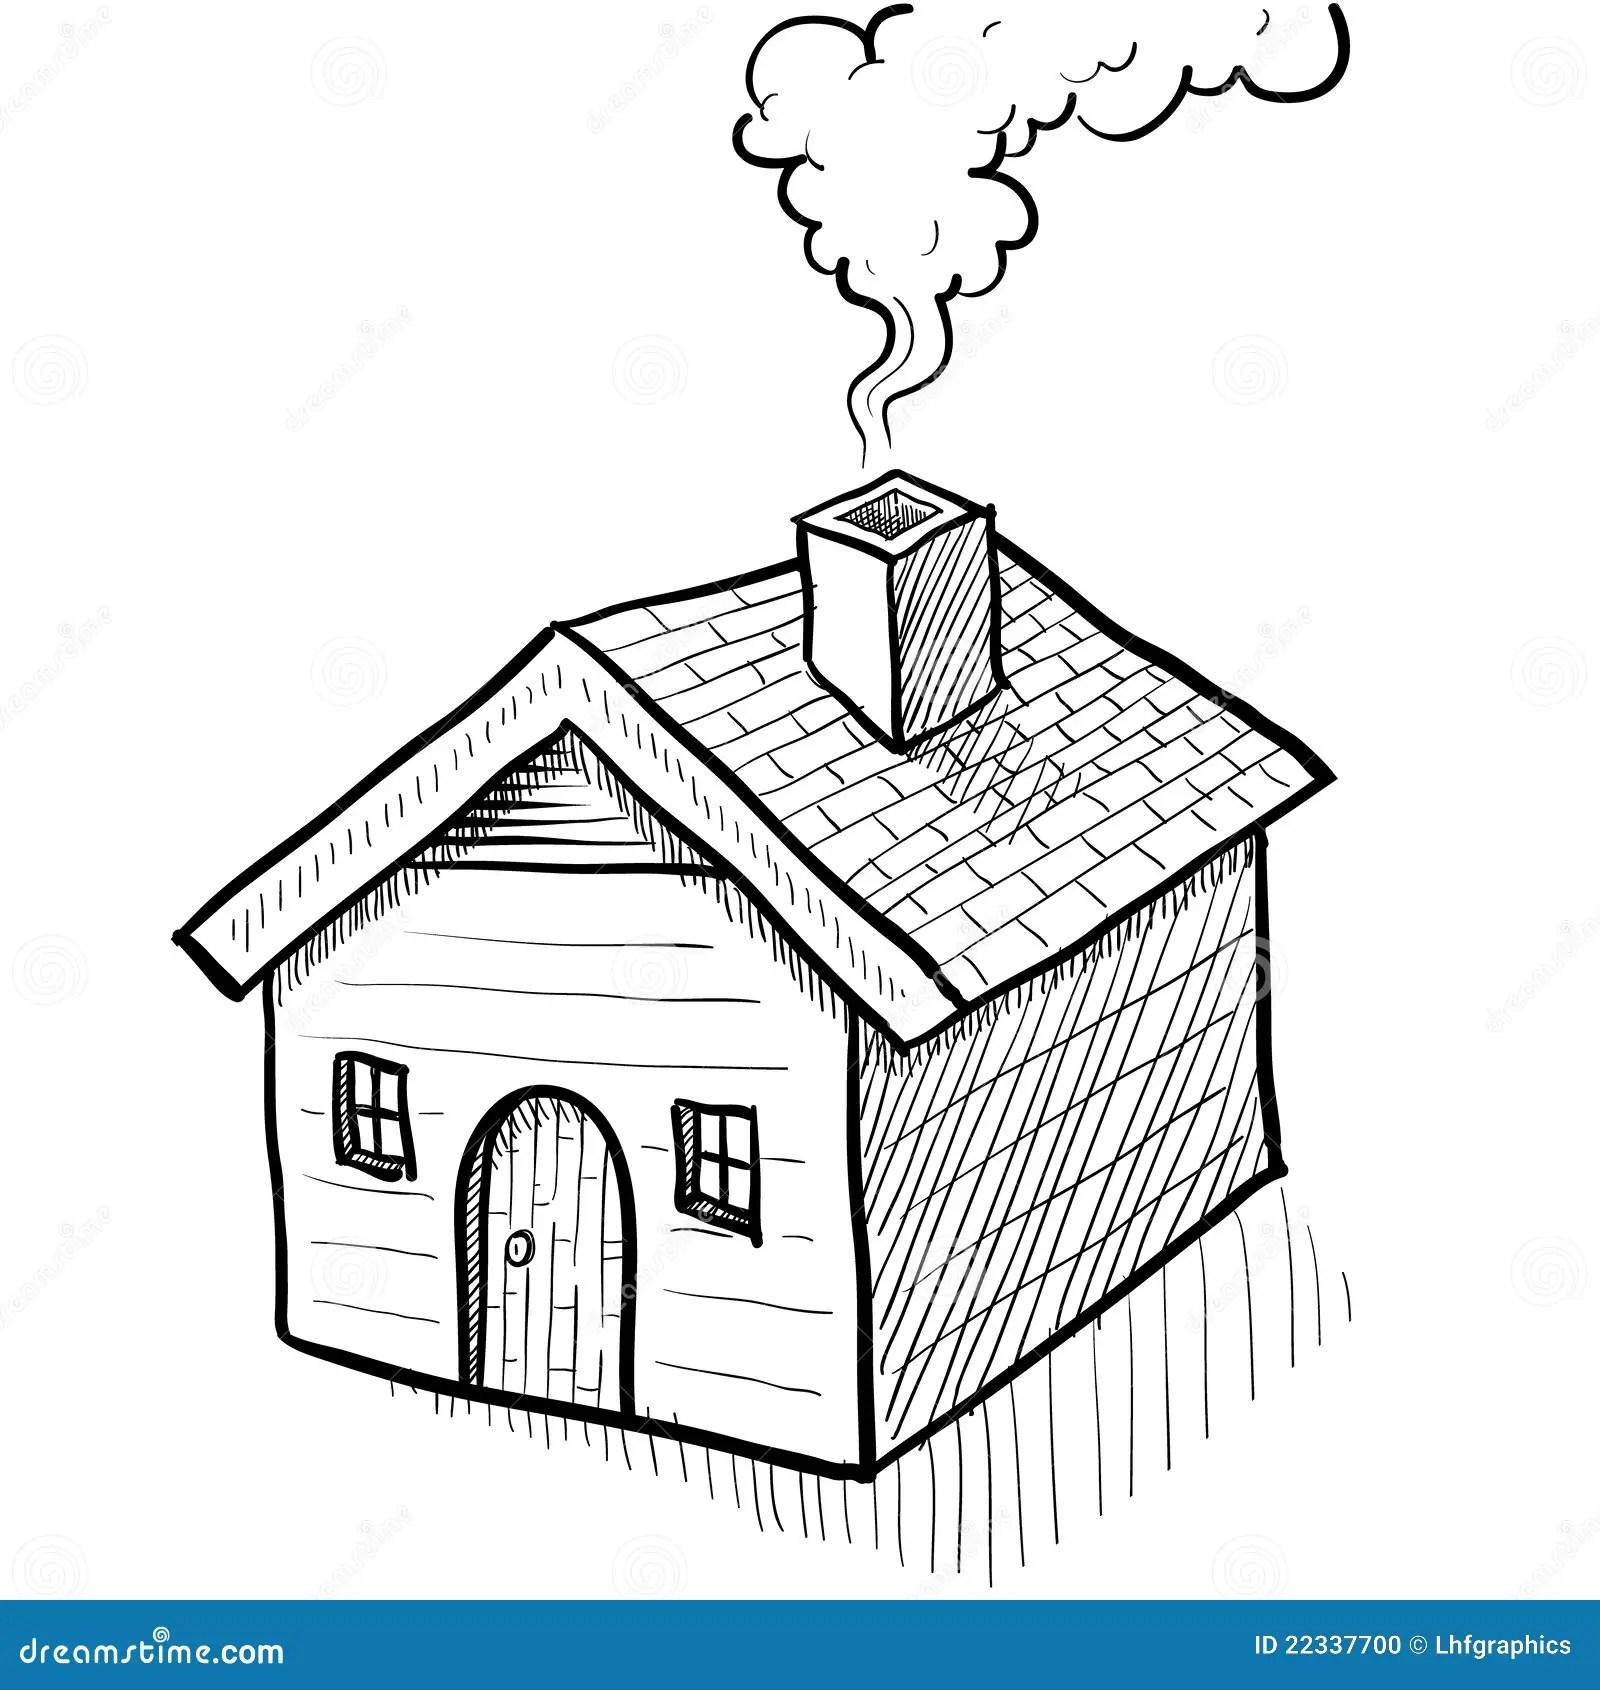 Comfy House Sketch Stock Vector Illustration Of Door